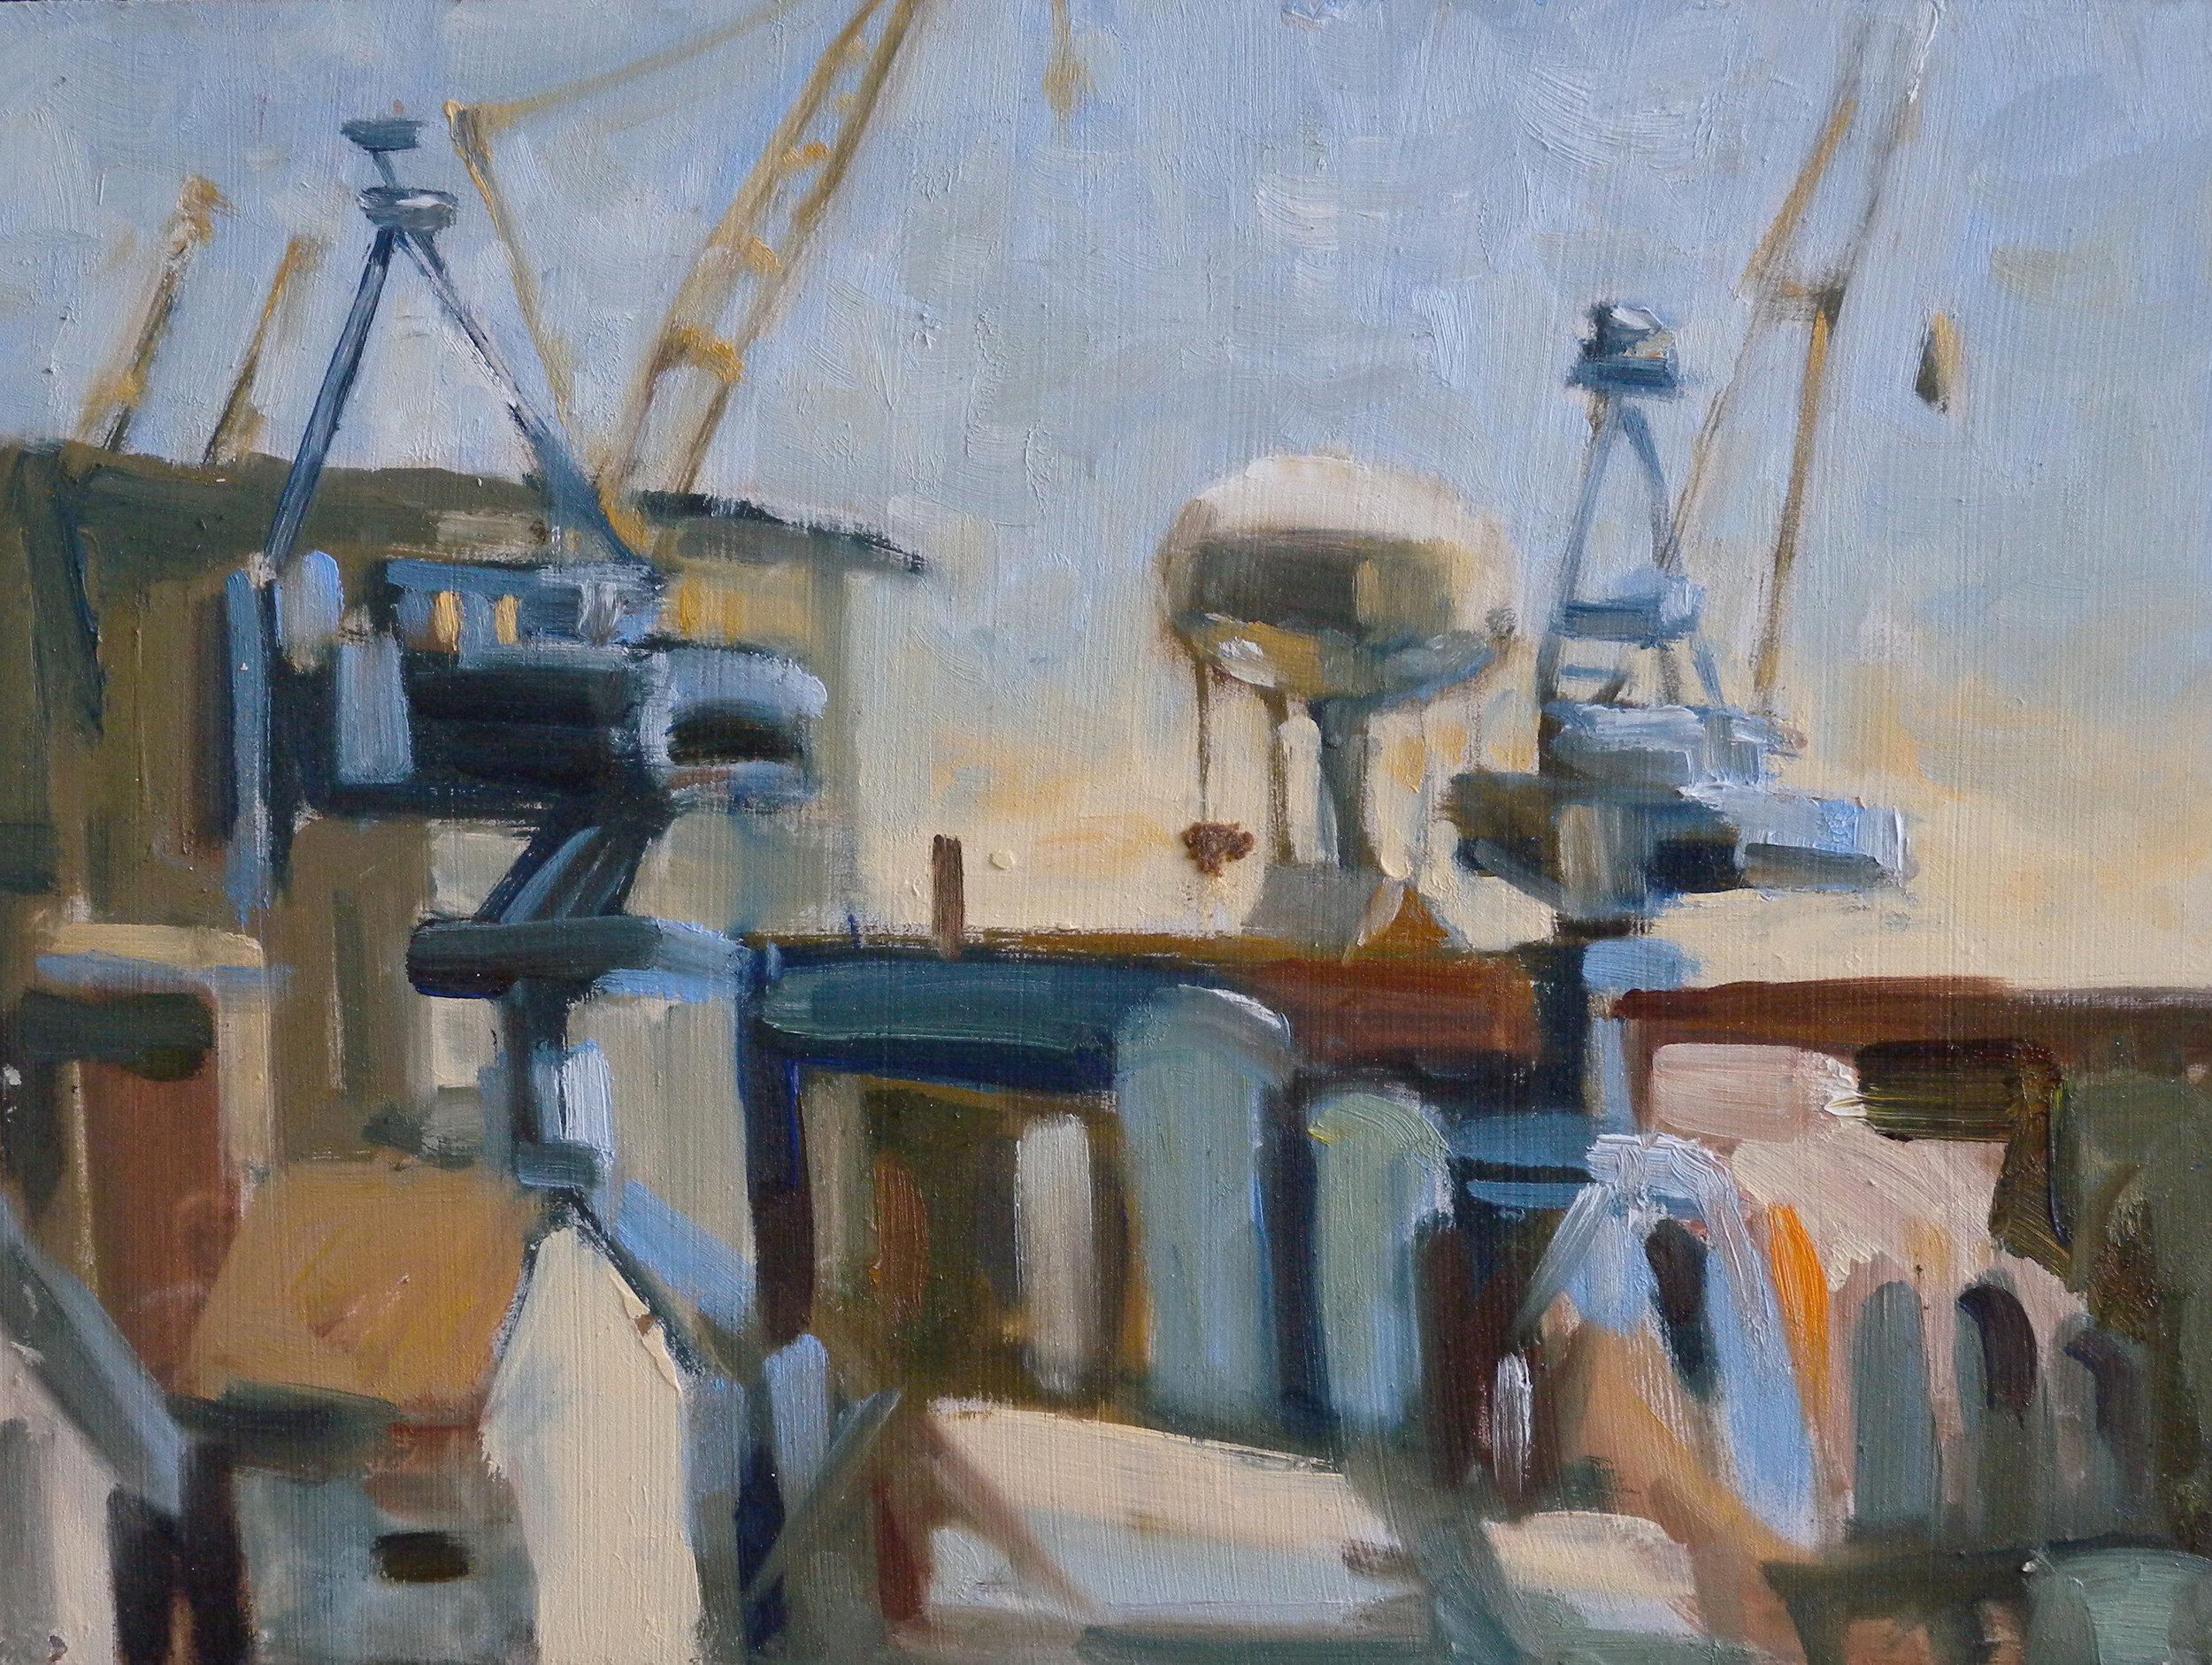 Two Crane w Tower, oils, 9 x 12